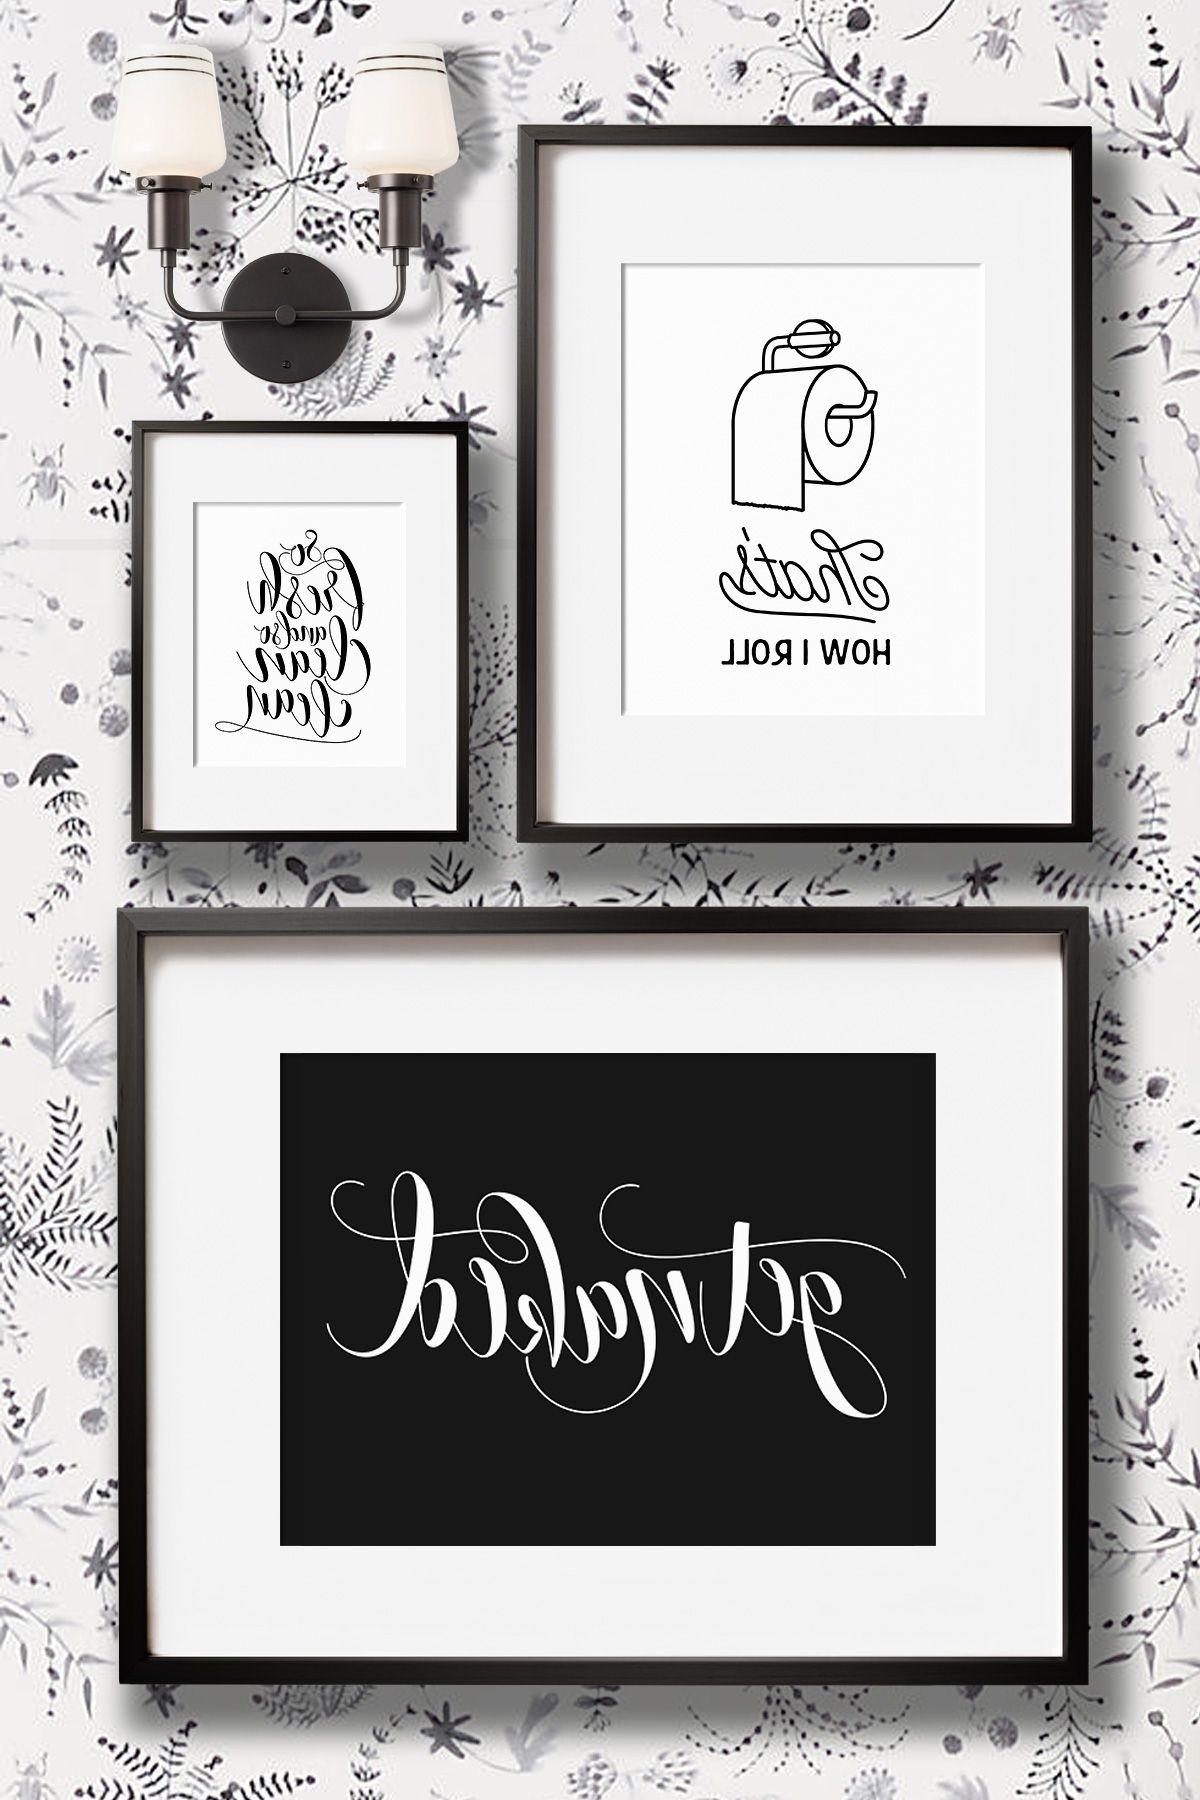 Bathroom Wall Art For 2018 Funny Bathroom Wall Decor Art Prints – Printable Art And Prints From (View 13 of 15)